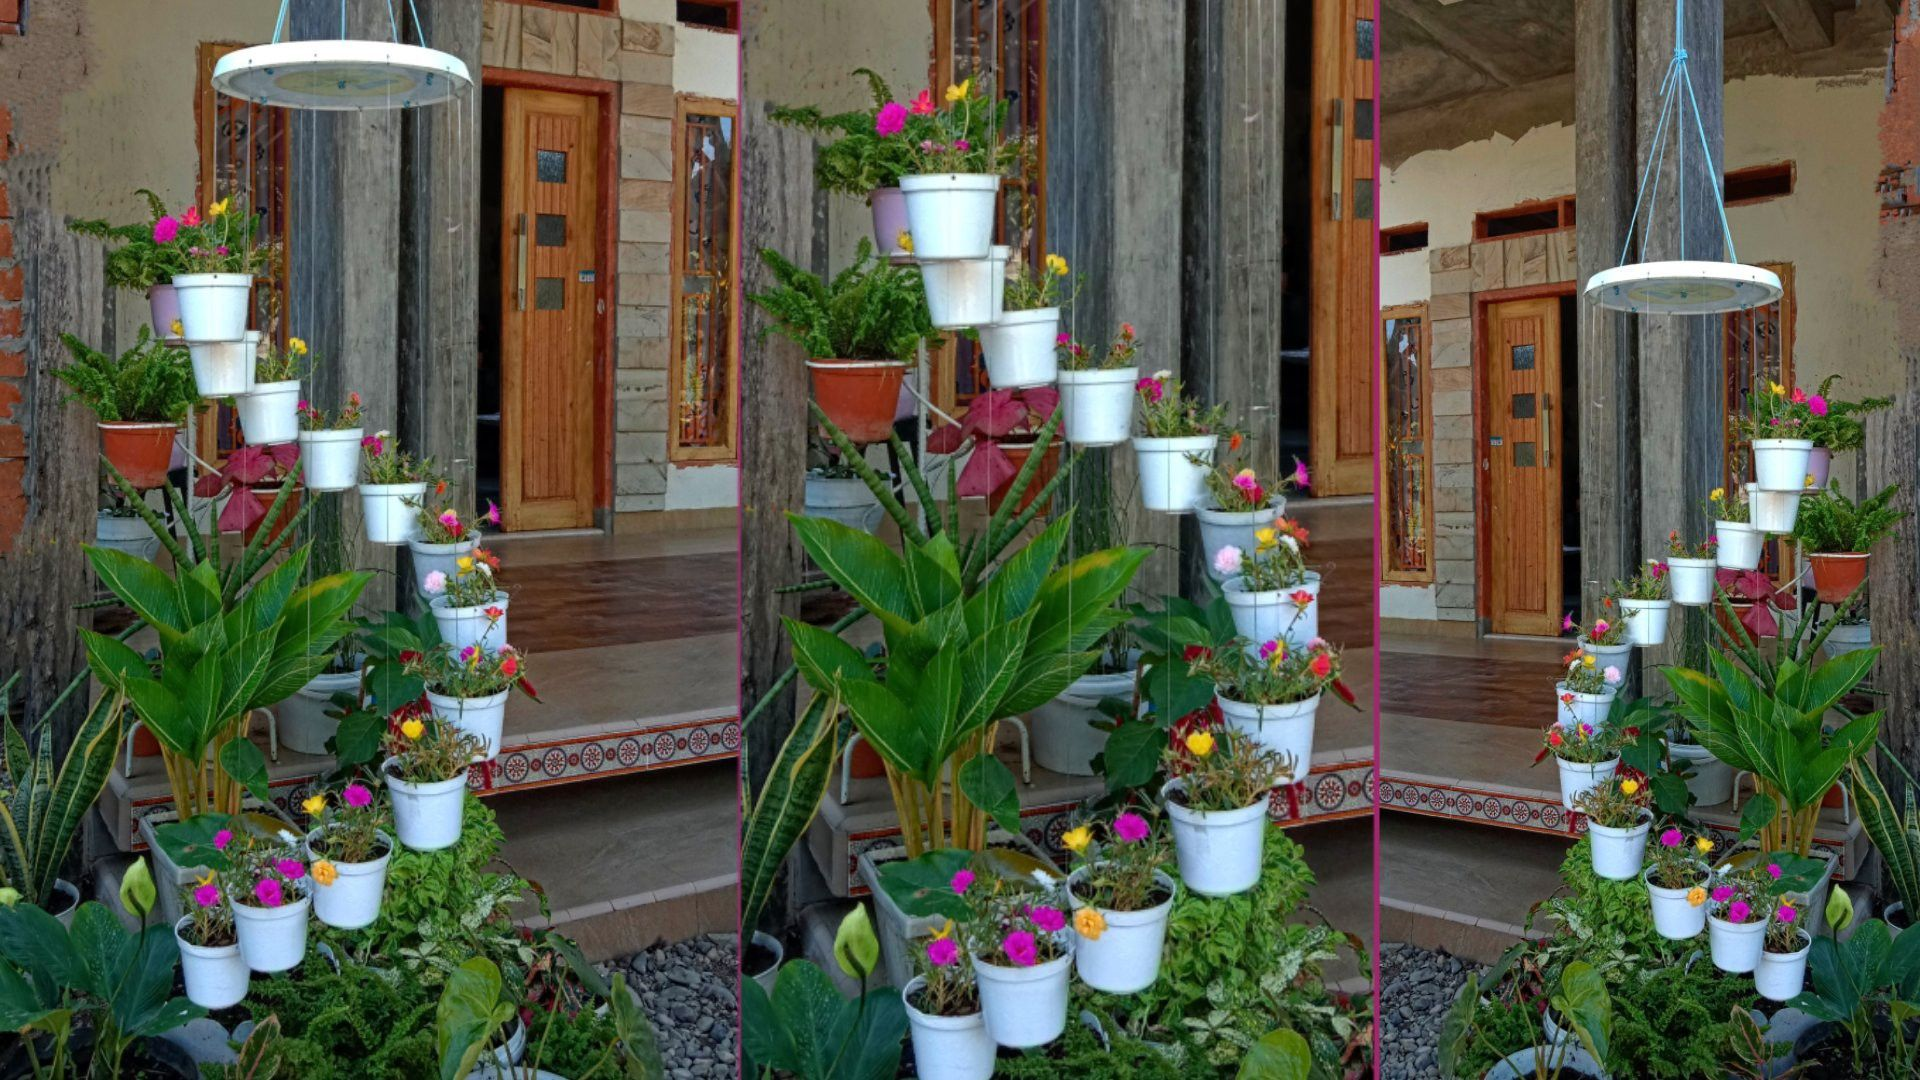 Cara Membuat Pot Gantung Spiral Unik Bunga Gantung Taman Hias Bergoyang Make A Spiral Hanging Pot Dekorasi Tanaman Bunga Gantung Ide Taman Depan